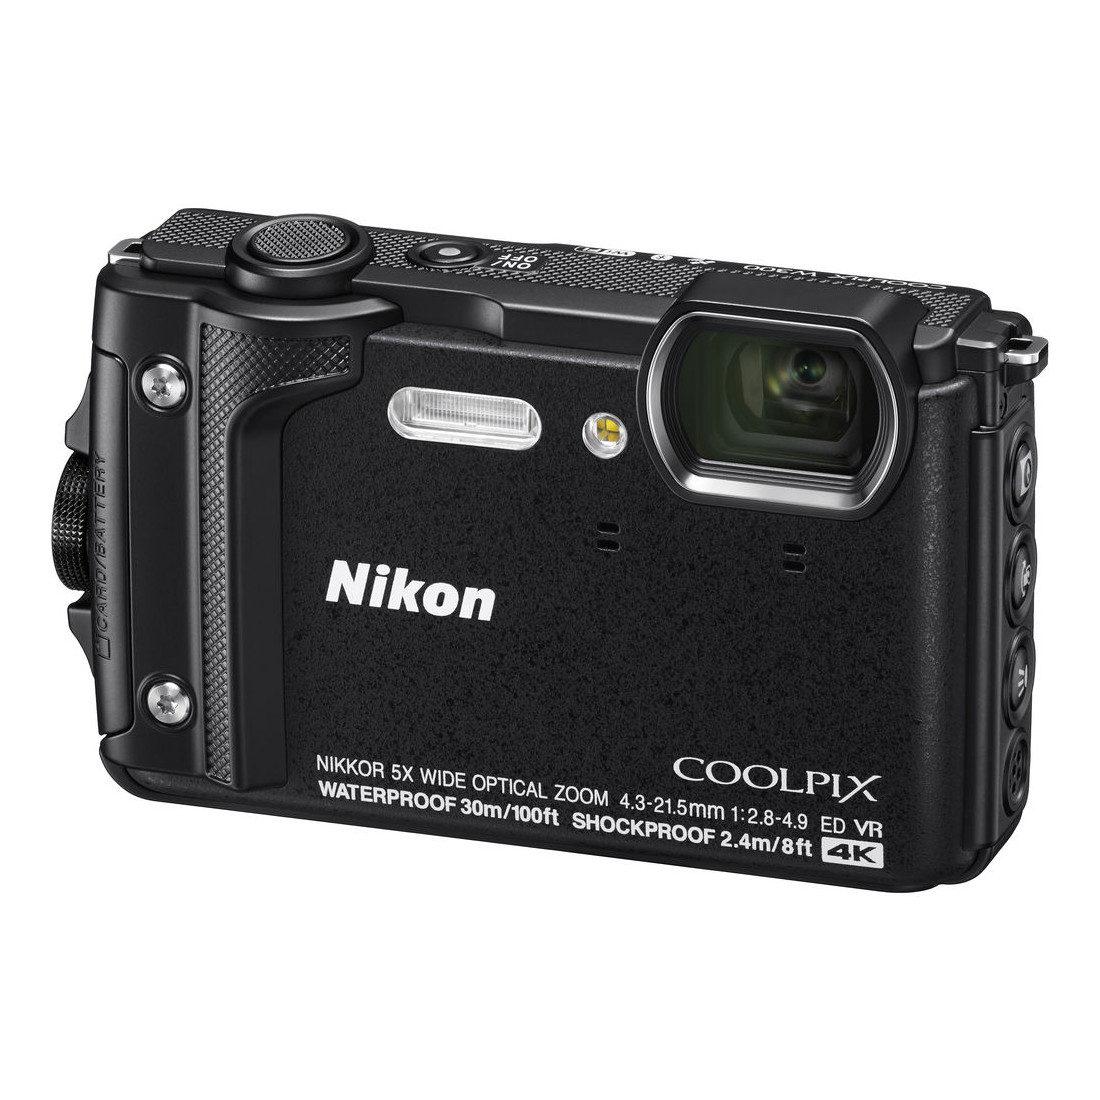 Nikon Coolpix W300 compact camera Zwart <br/>€ 399.00 <br/> <a href='https://www.cameranu.nl/fotografie/?tt=12190_474631_241358_&r=https%3A%2F%2Fwww.cameranu.nl%2Fnl%2Fp1854335%2Fnikon-coolpix-w300-compact-camera-zwart%3Fchannable%3De10841.MTg1NDMzNQ%26utm_campaign%3D%26utm_content%3DCompact%2Bcamera%26utm_source%3DTradetracker%26utm_medium%3Dcpc%26utm_term%3DDigitale%2Bcamera%26apos%3Bs' target='_blank'>naar de winkel</a>